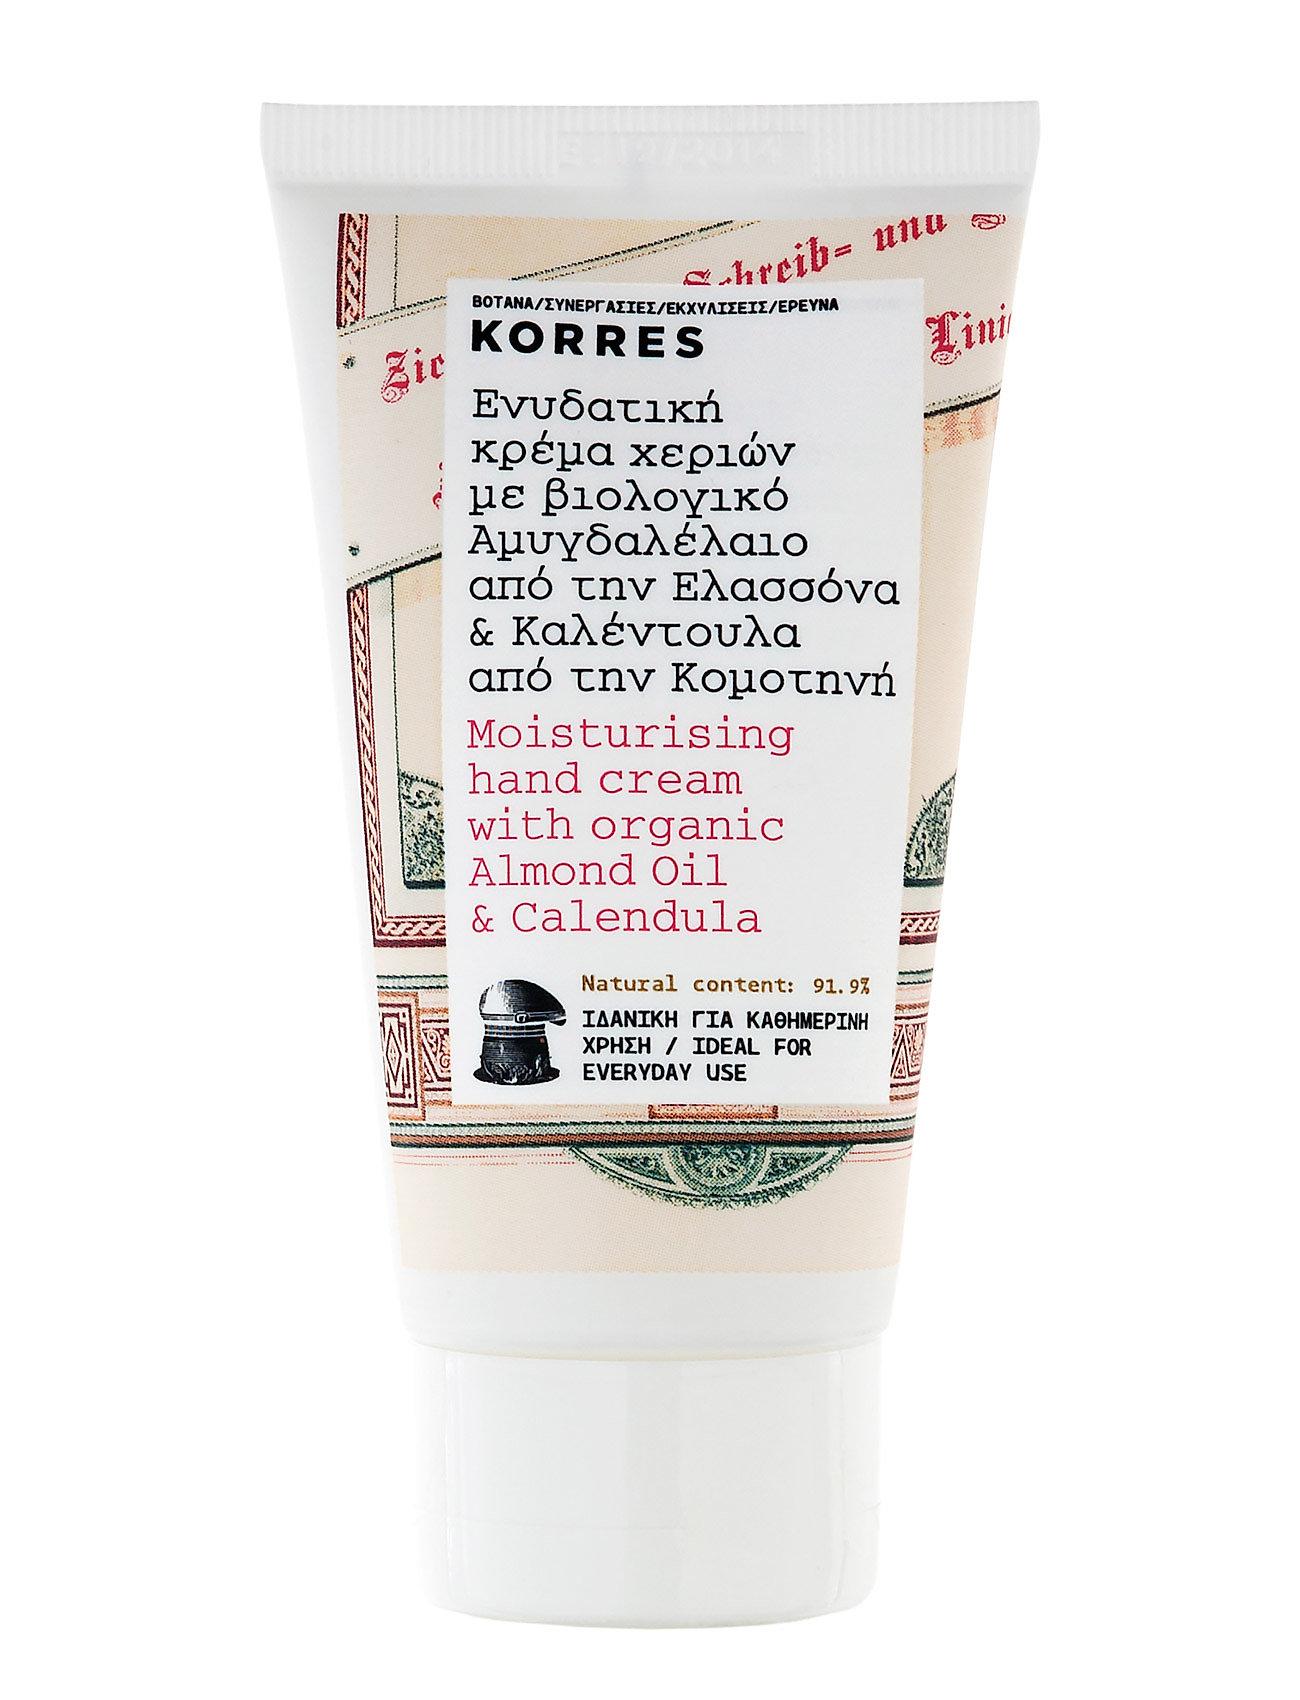 korres – Almond oil/calendula hand cream 75ml på boozt.com dk